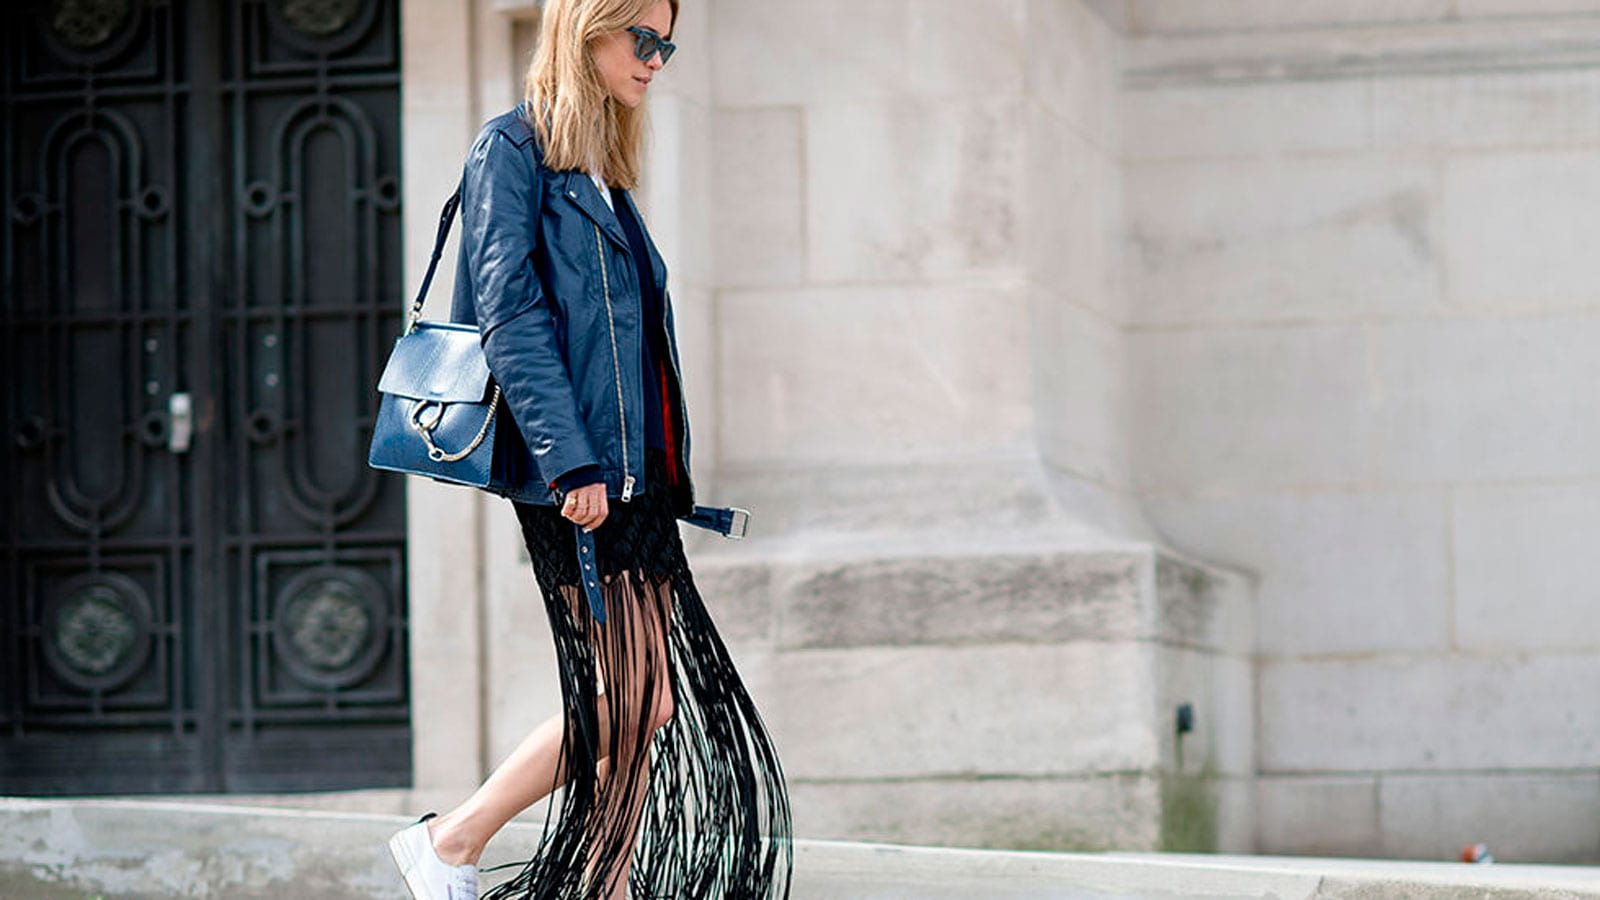 StyleAndMinimalism | Street Style | Paris Fashion Week | Pernille Teisbaek Photographed by Tyler Joe